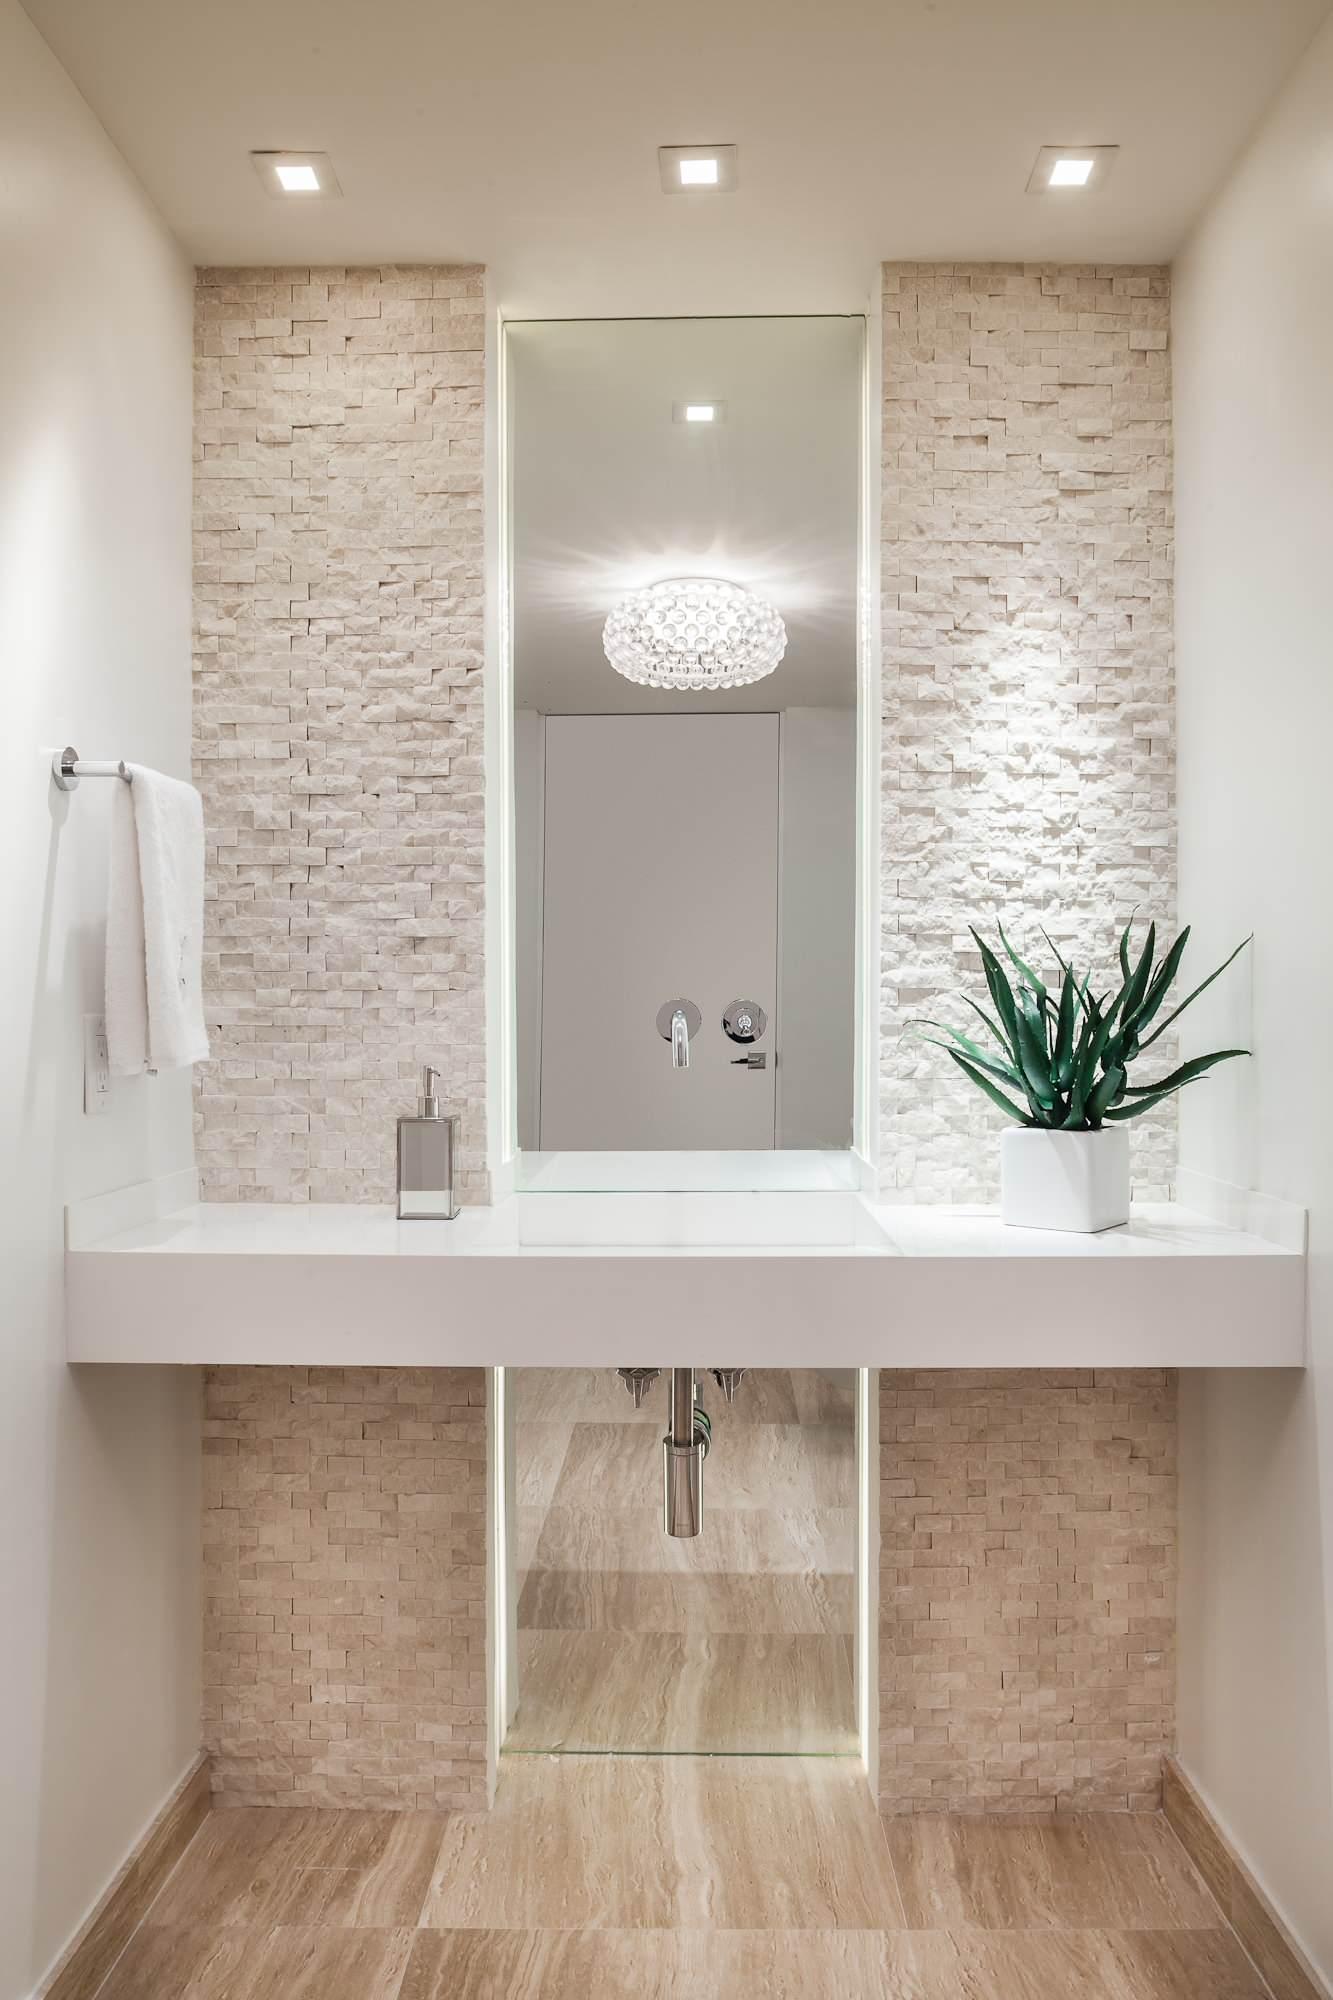 Contemporary Powder Room All White Cream Stone Accent Wall Ideas Cobblestone Washroom Bathroom Modern Organic Style Living Home Decor